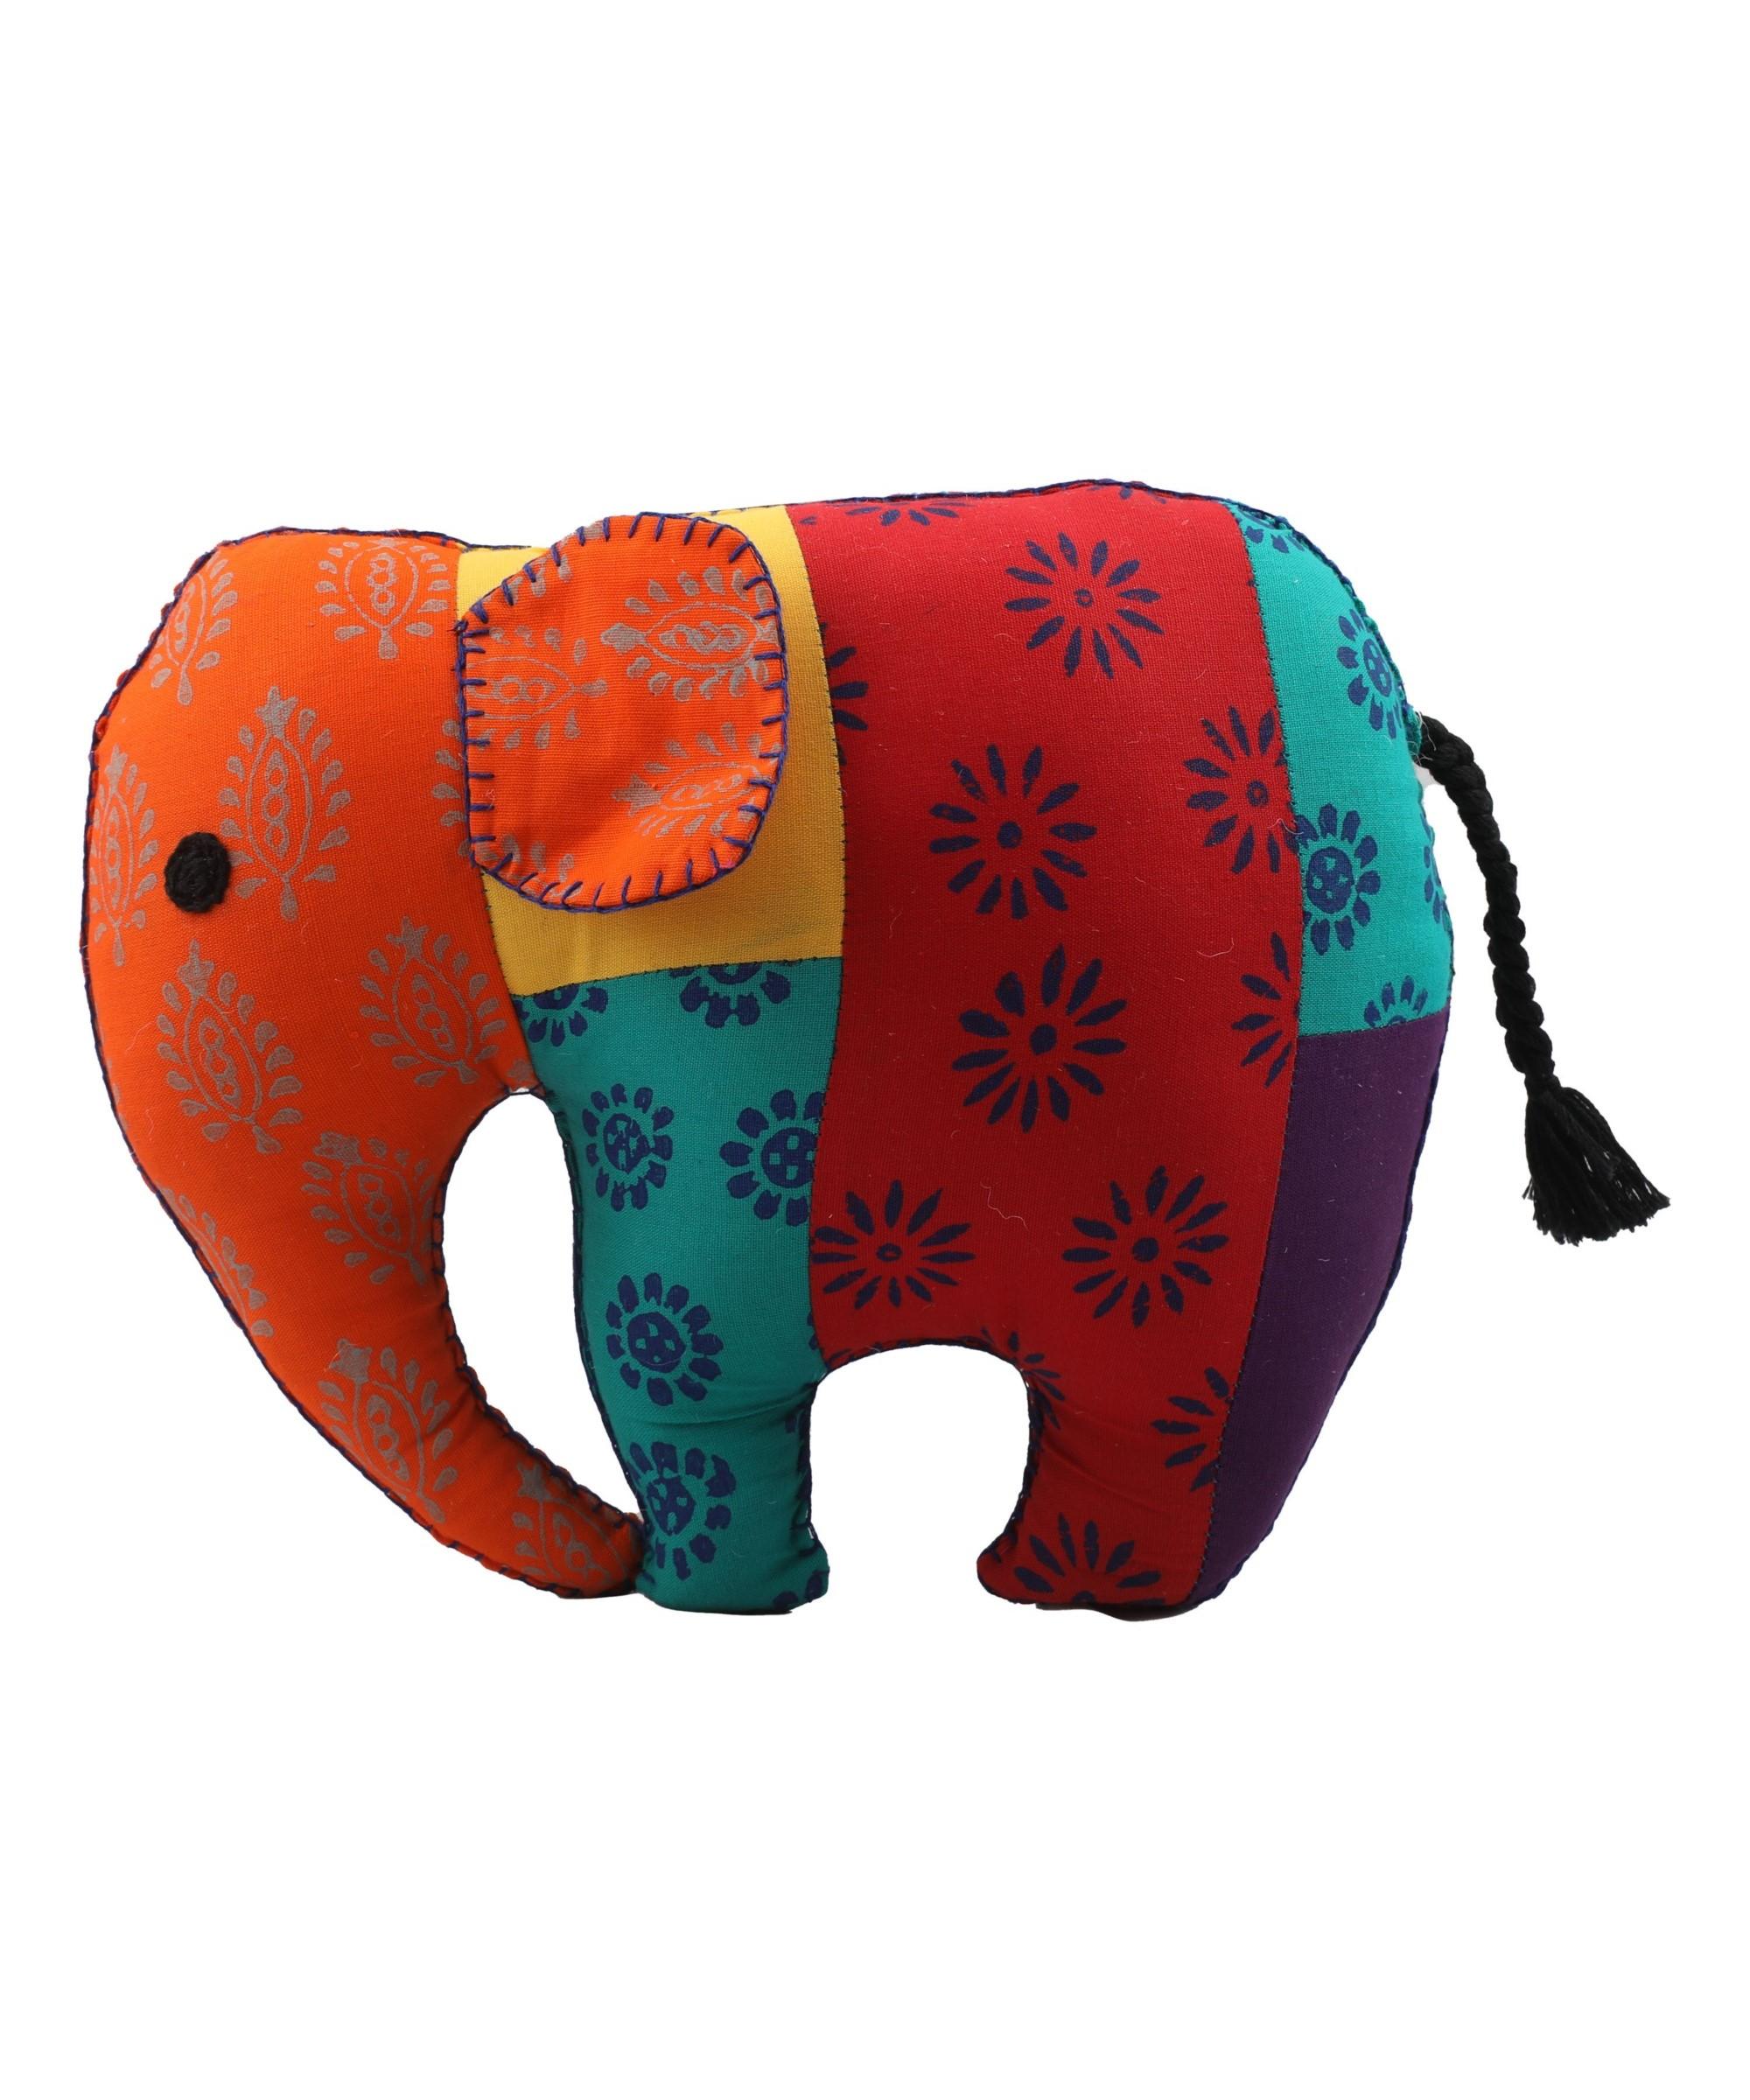 Elephant - Patchwork Soft Toy